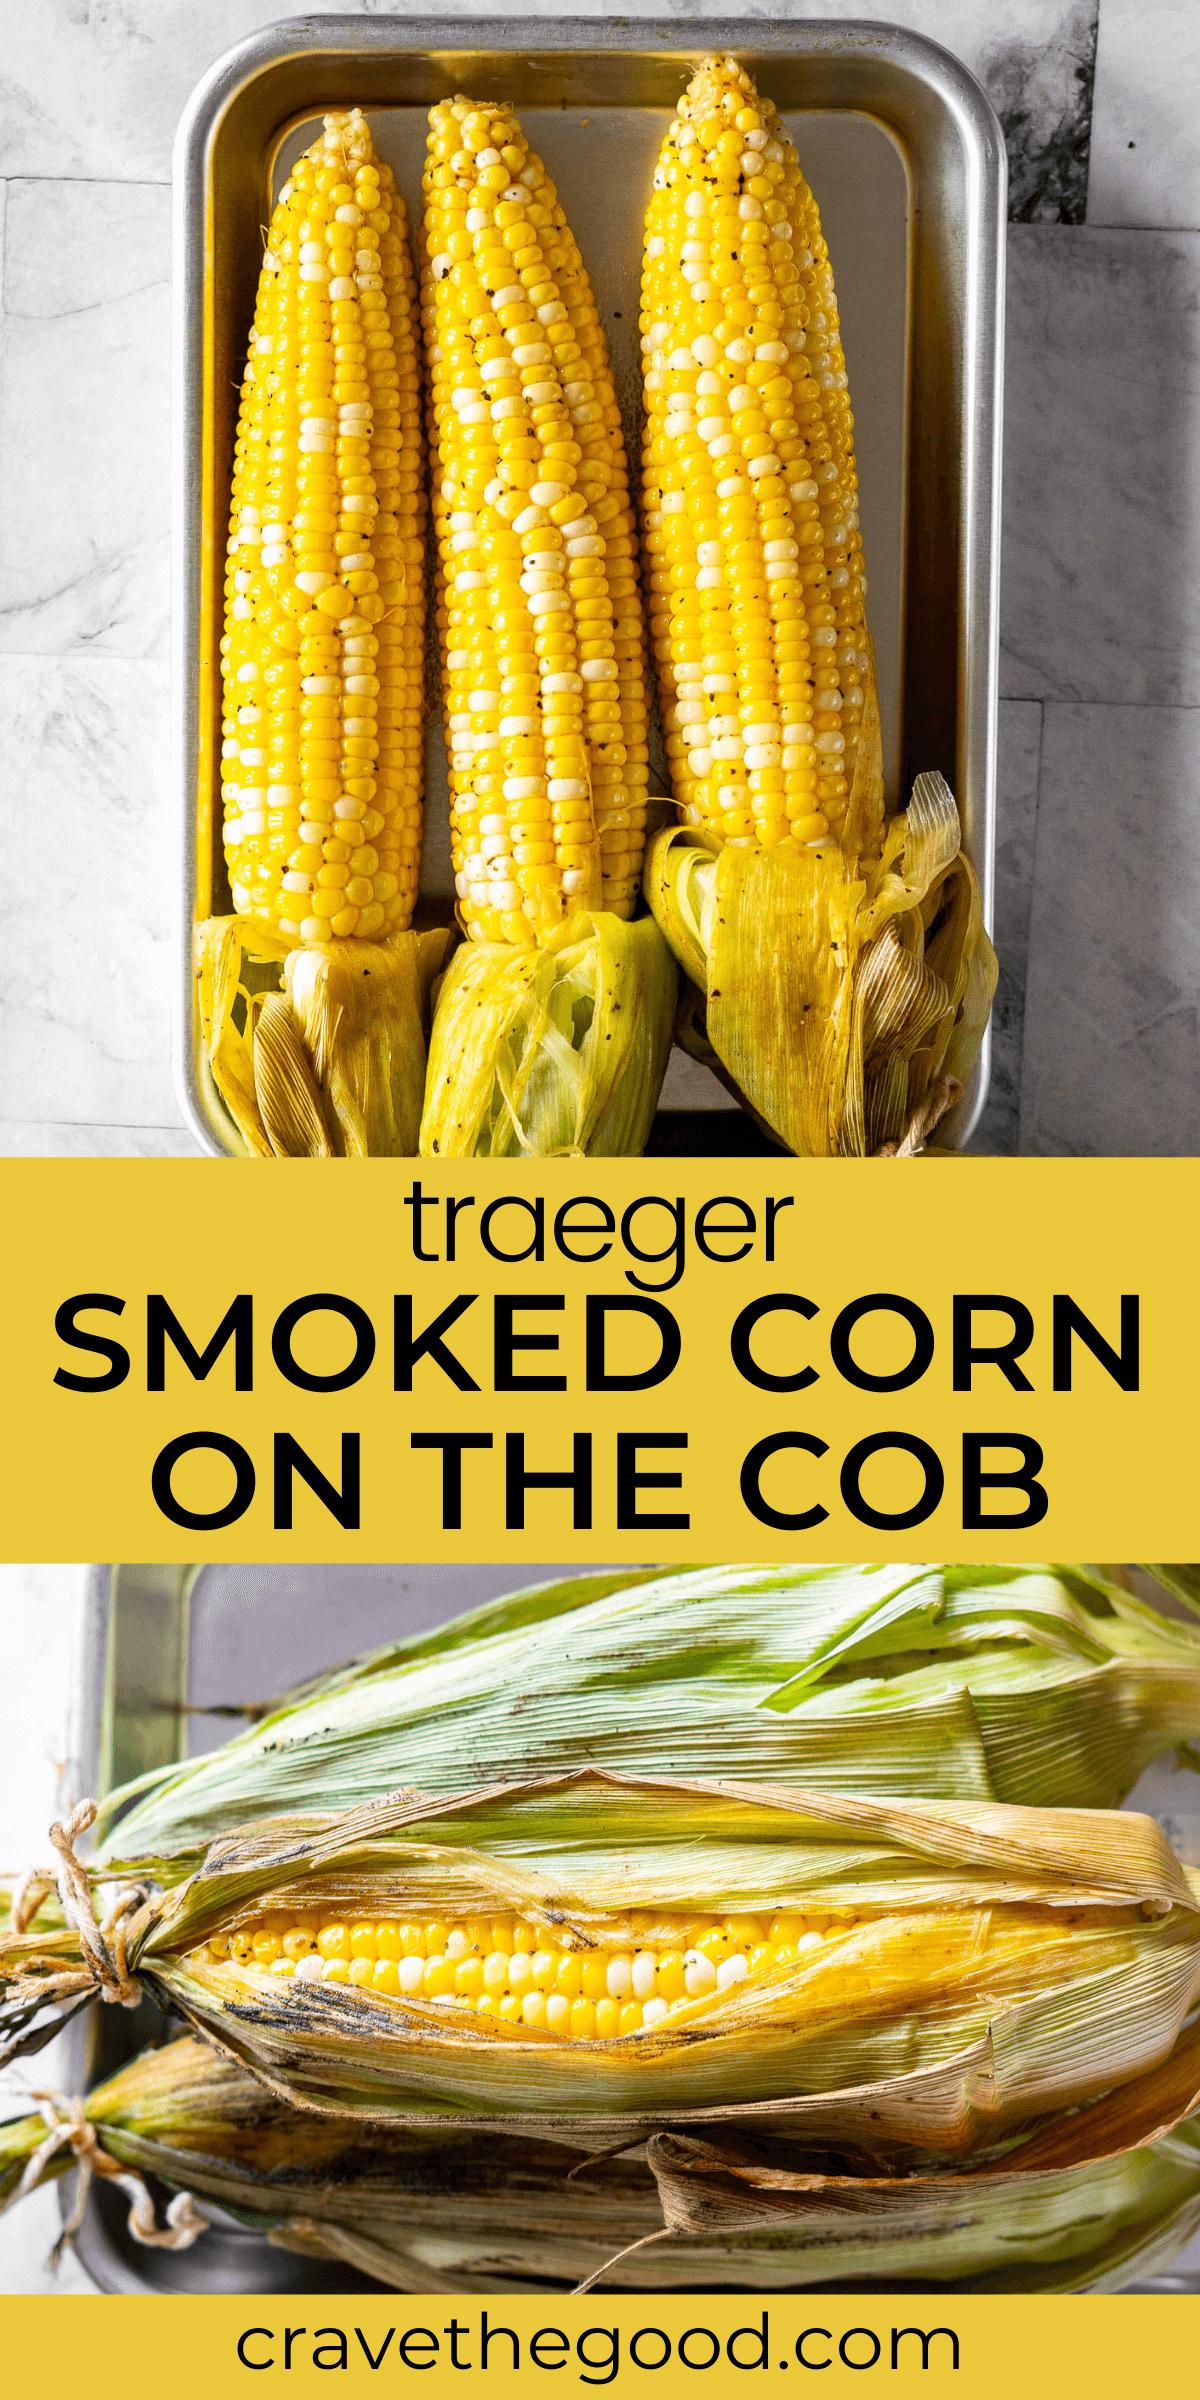 Traeger smoked corn on the cob pinterest graphic.